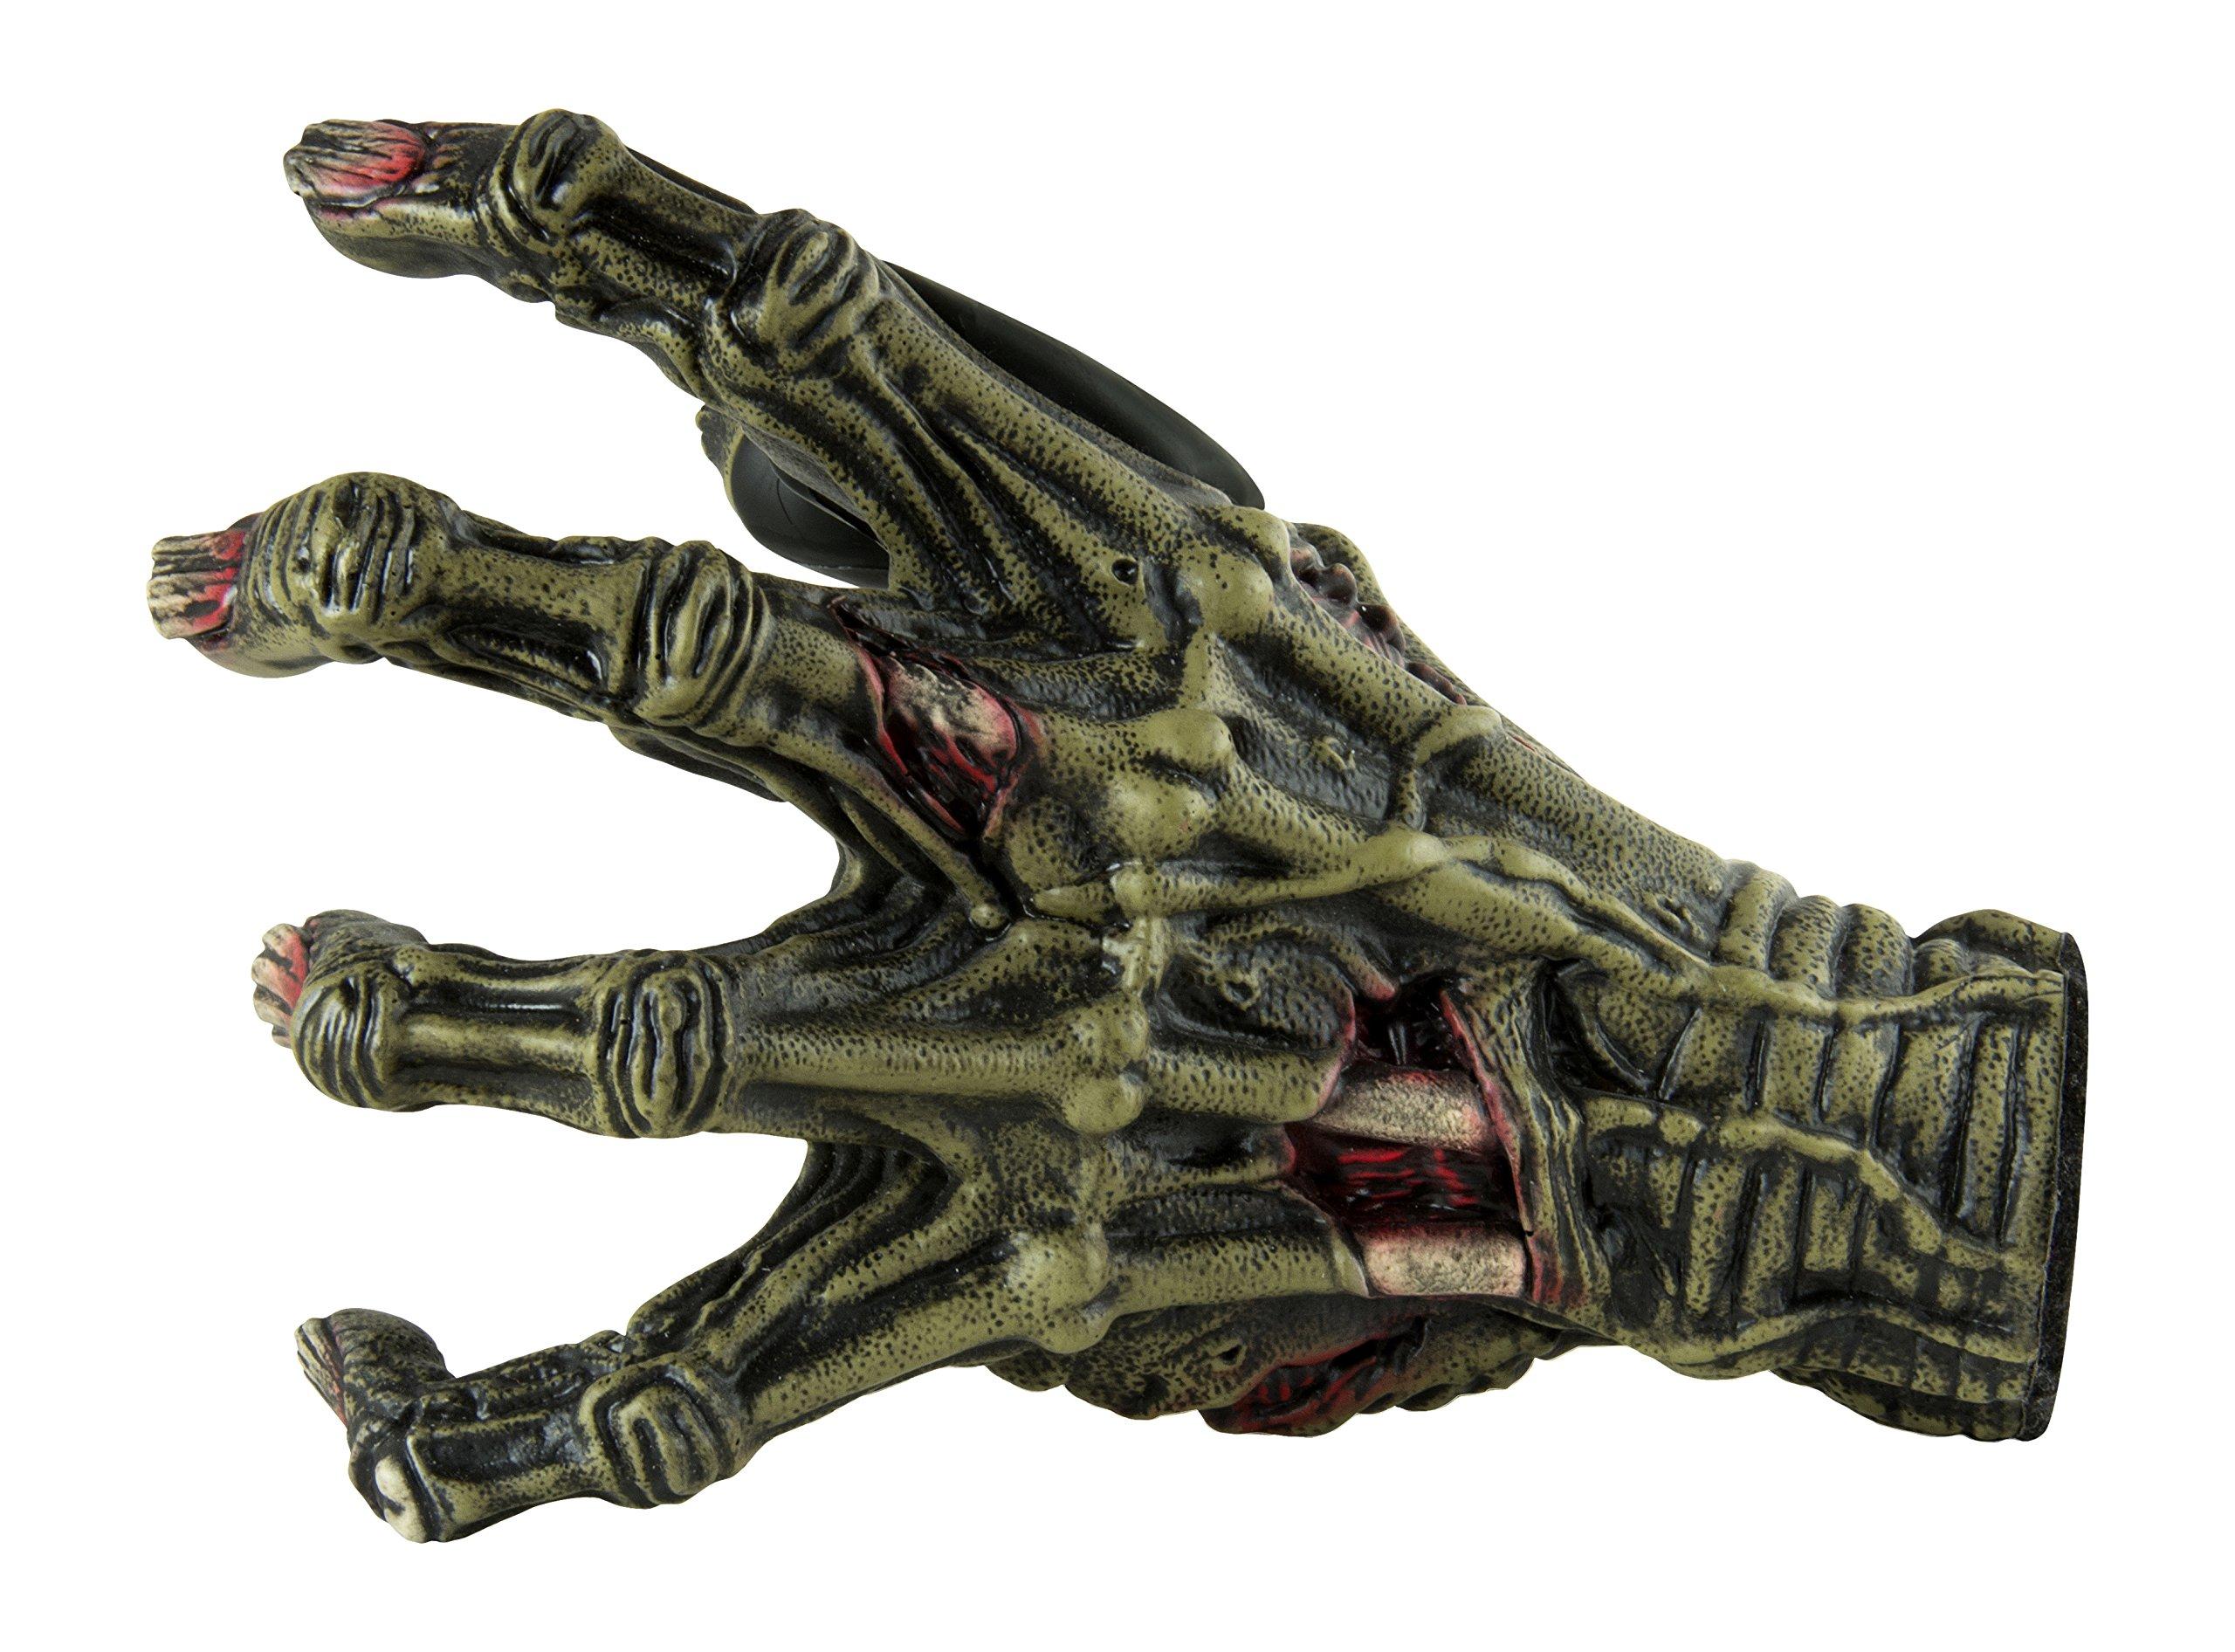 GuitarGrip LHGH-133 Hanger - Toxic Zombie Hand